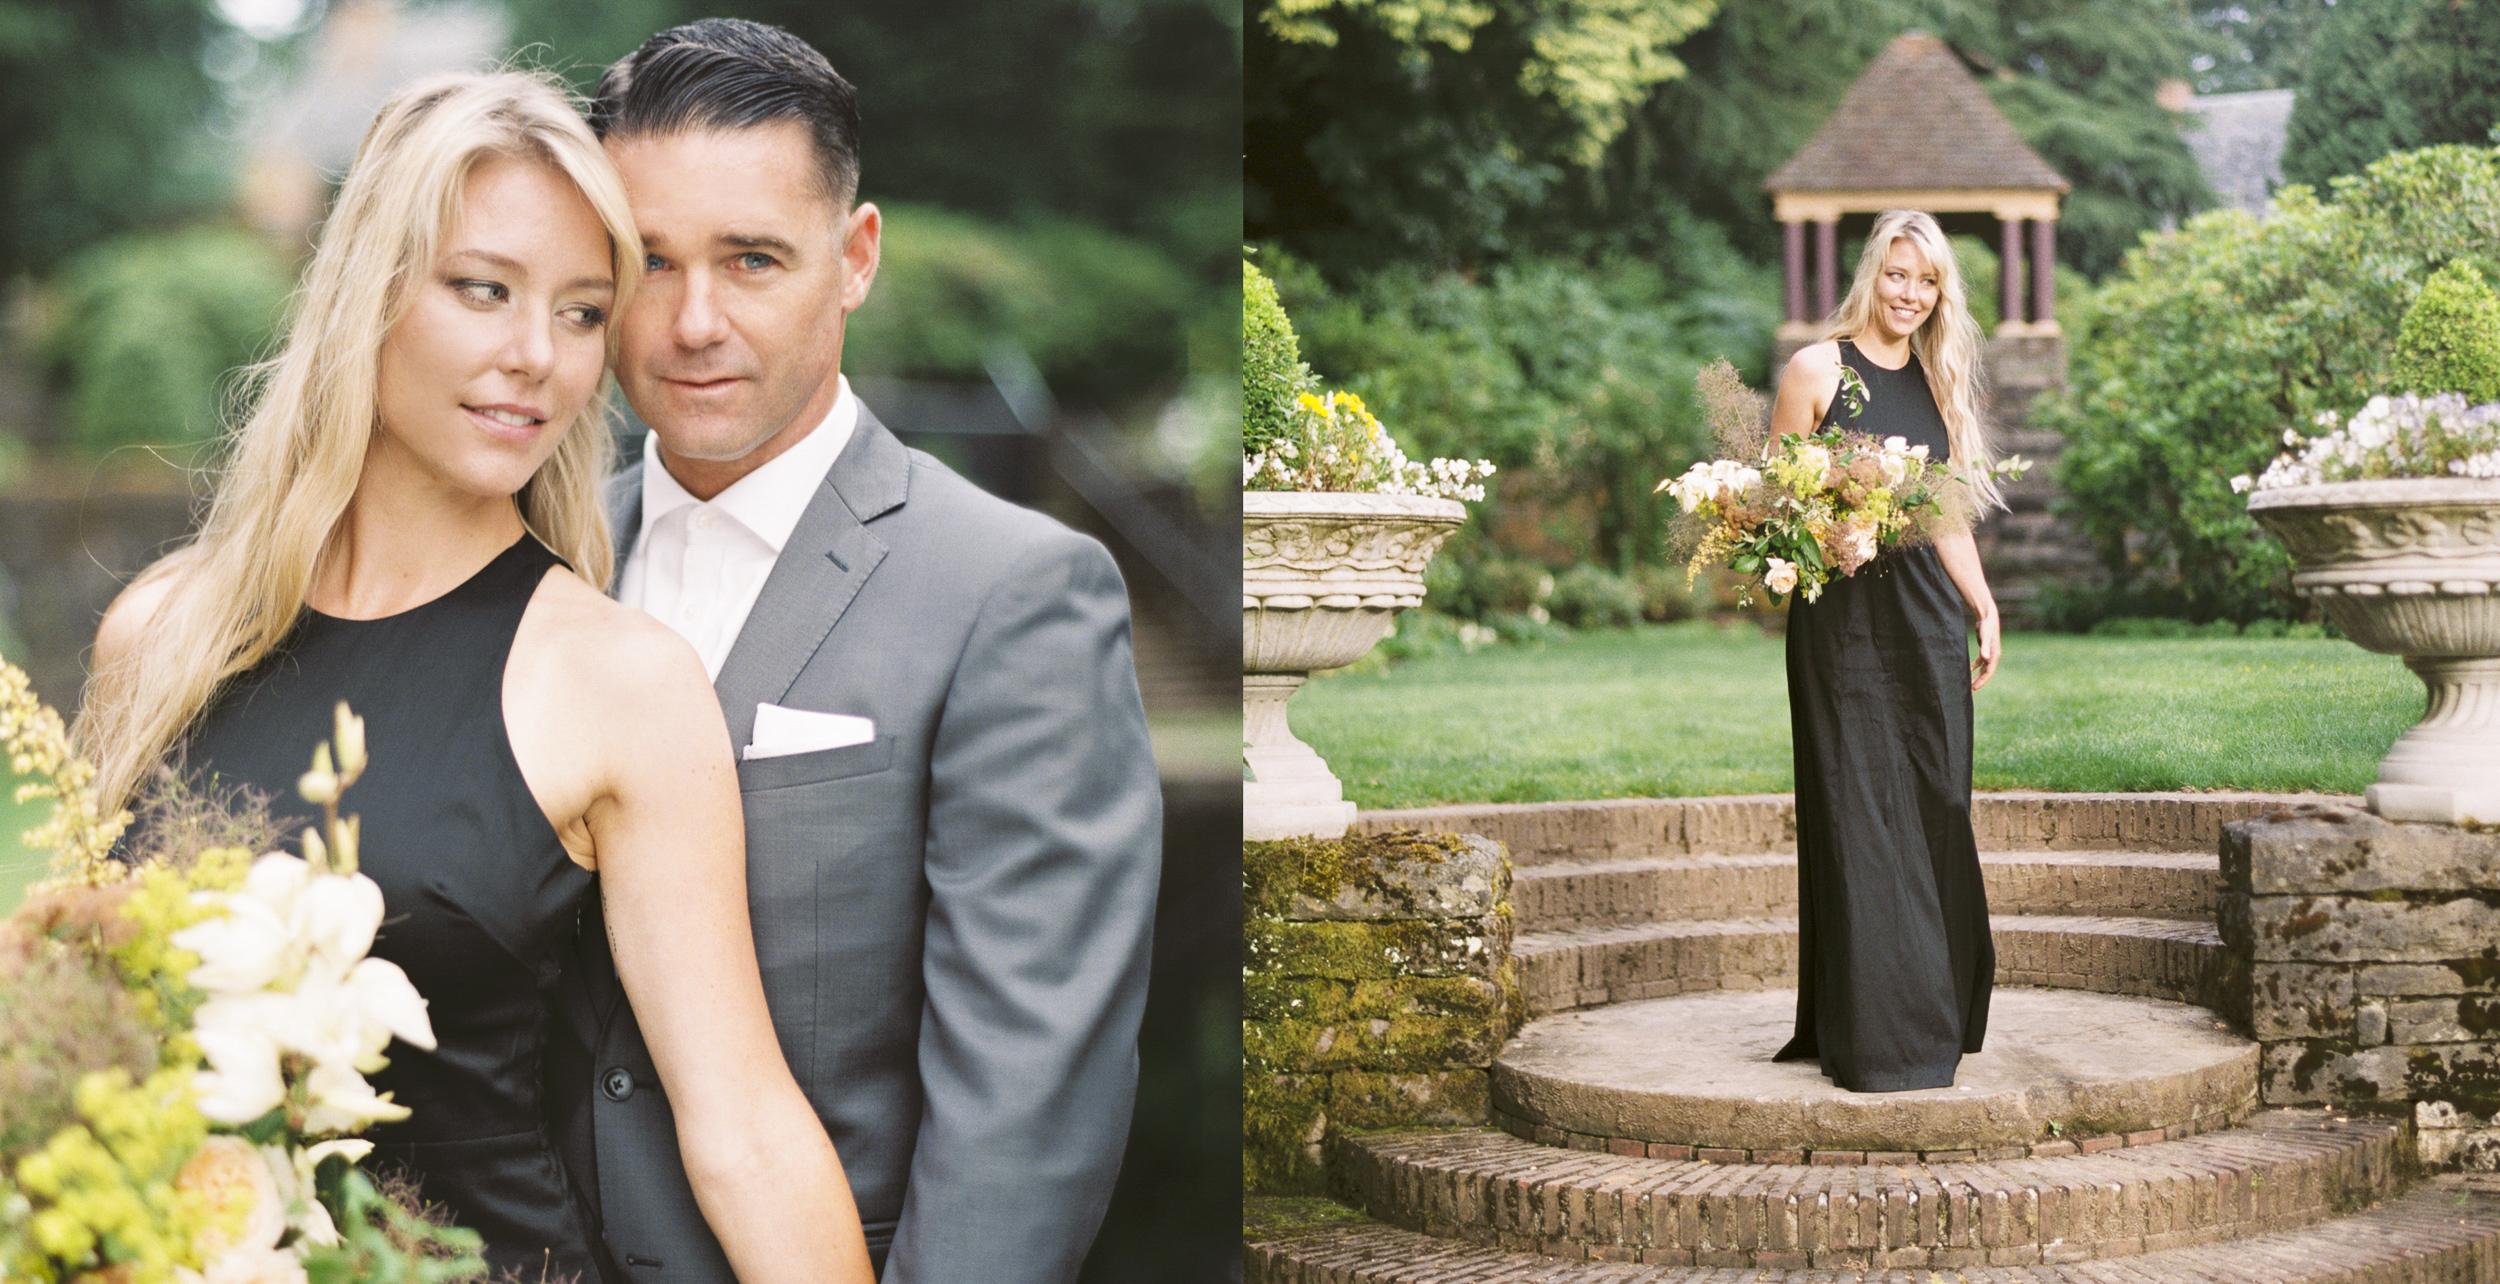 10_best+wedding+photographer+videographer+luxury+weddings+elopements_.jpg